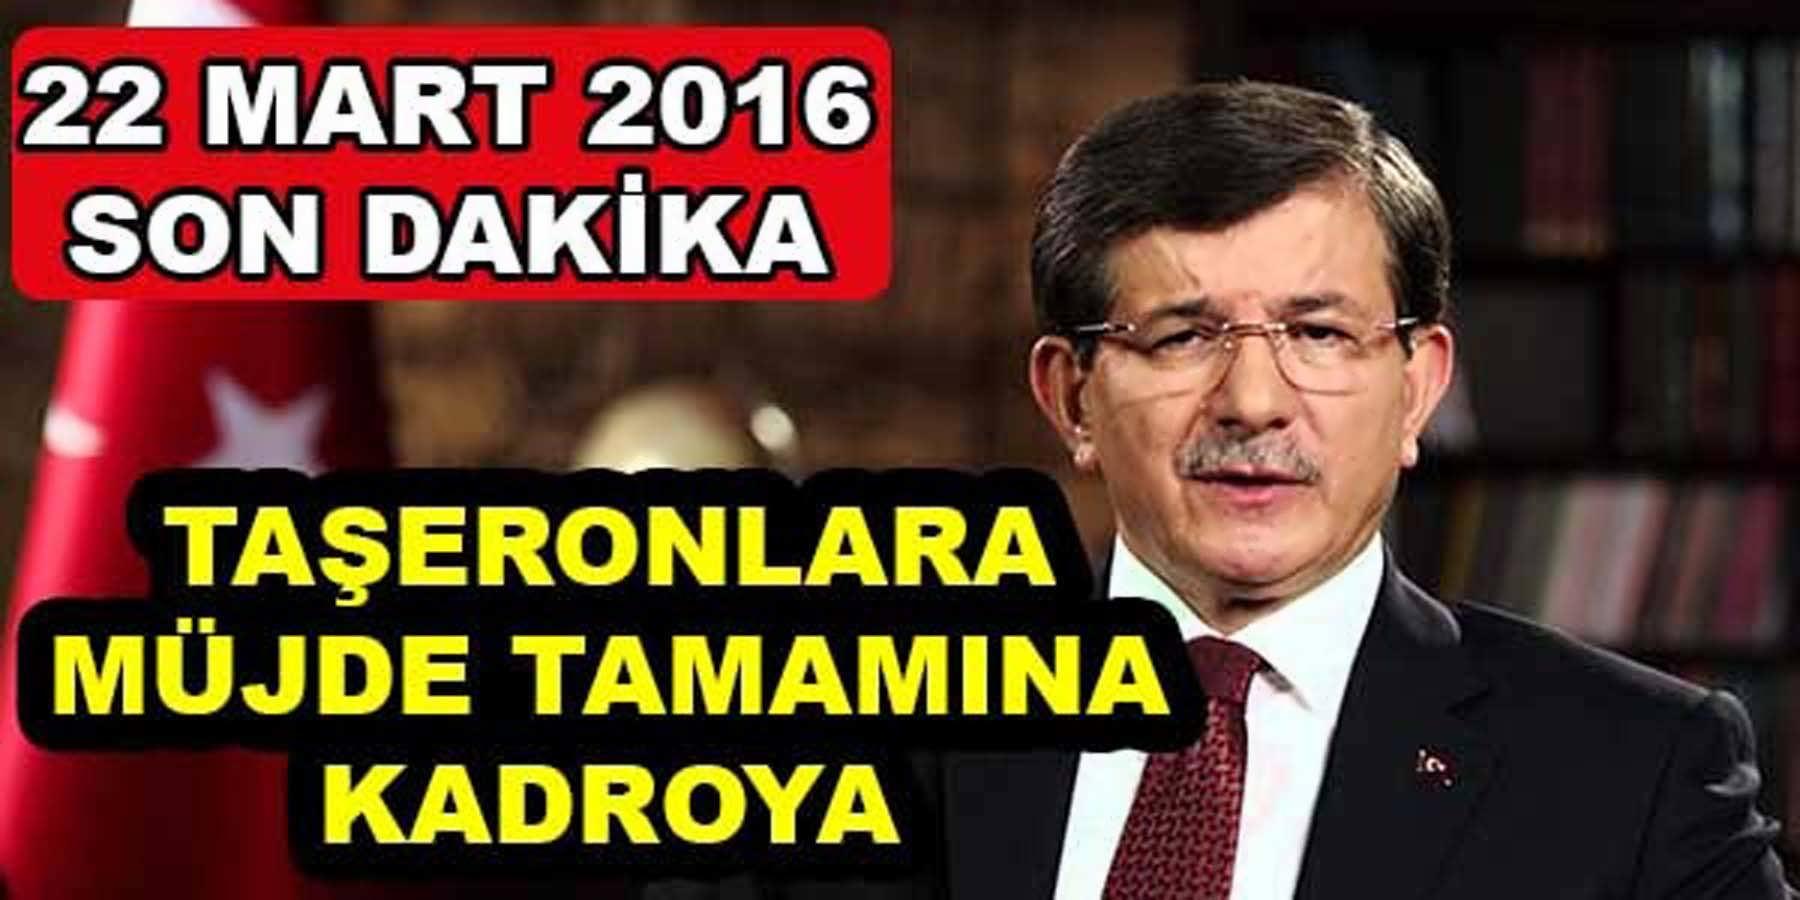 22 Mart 2016 Başbakan Davutoğlu Taşeronlara Kadro